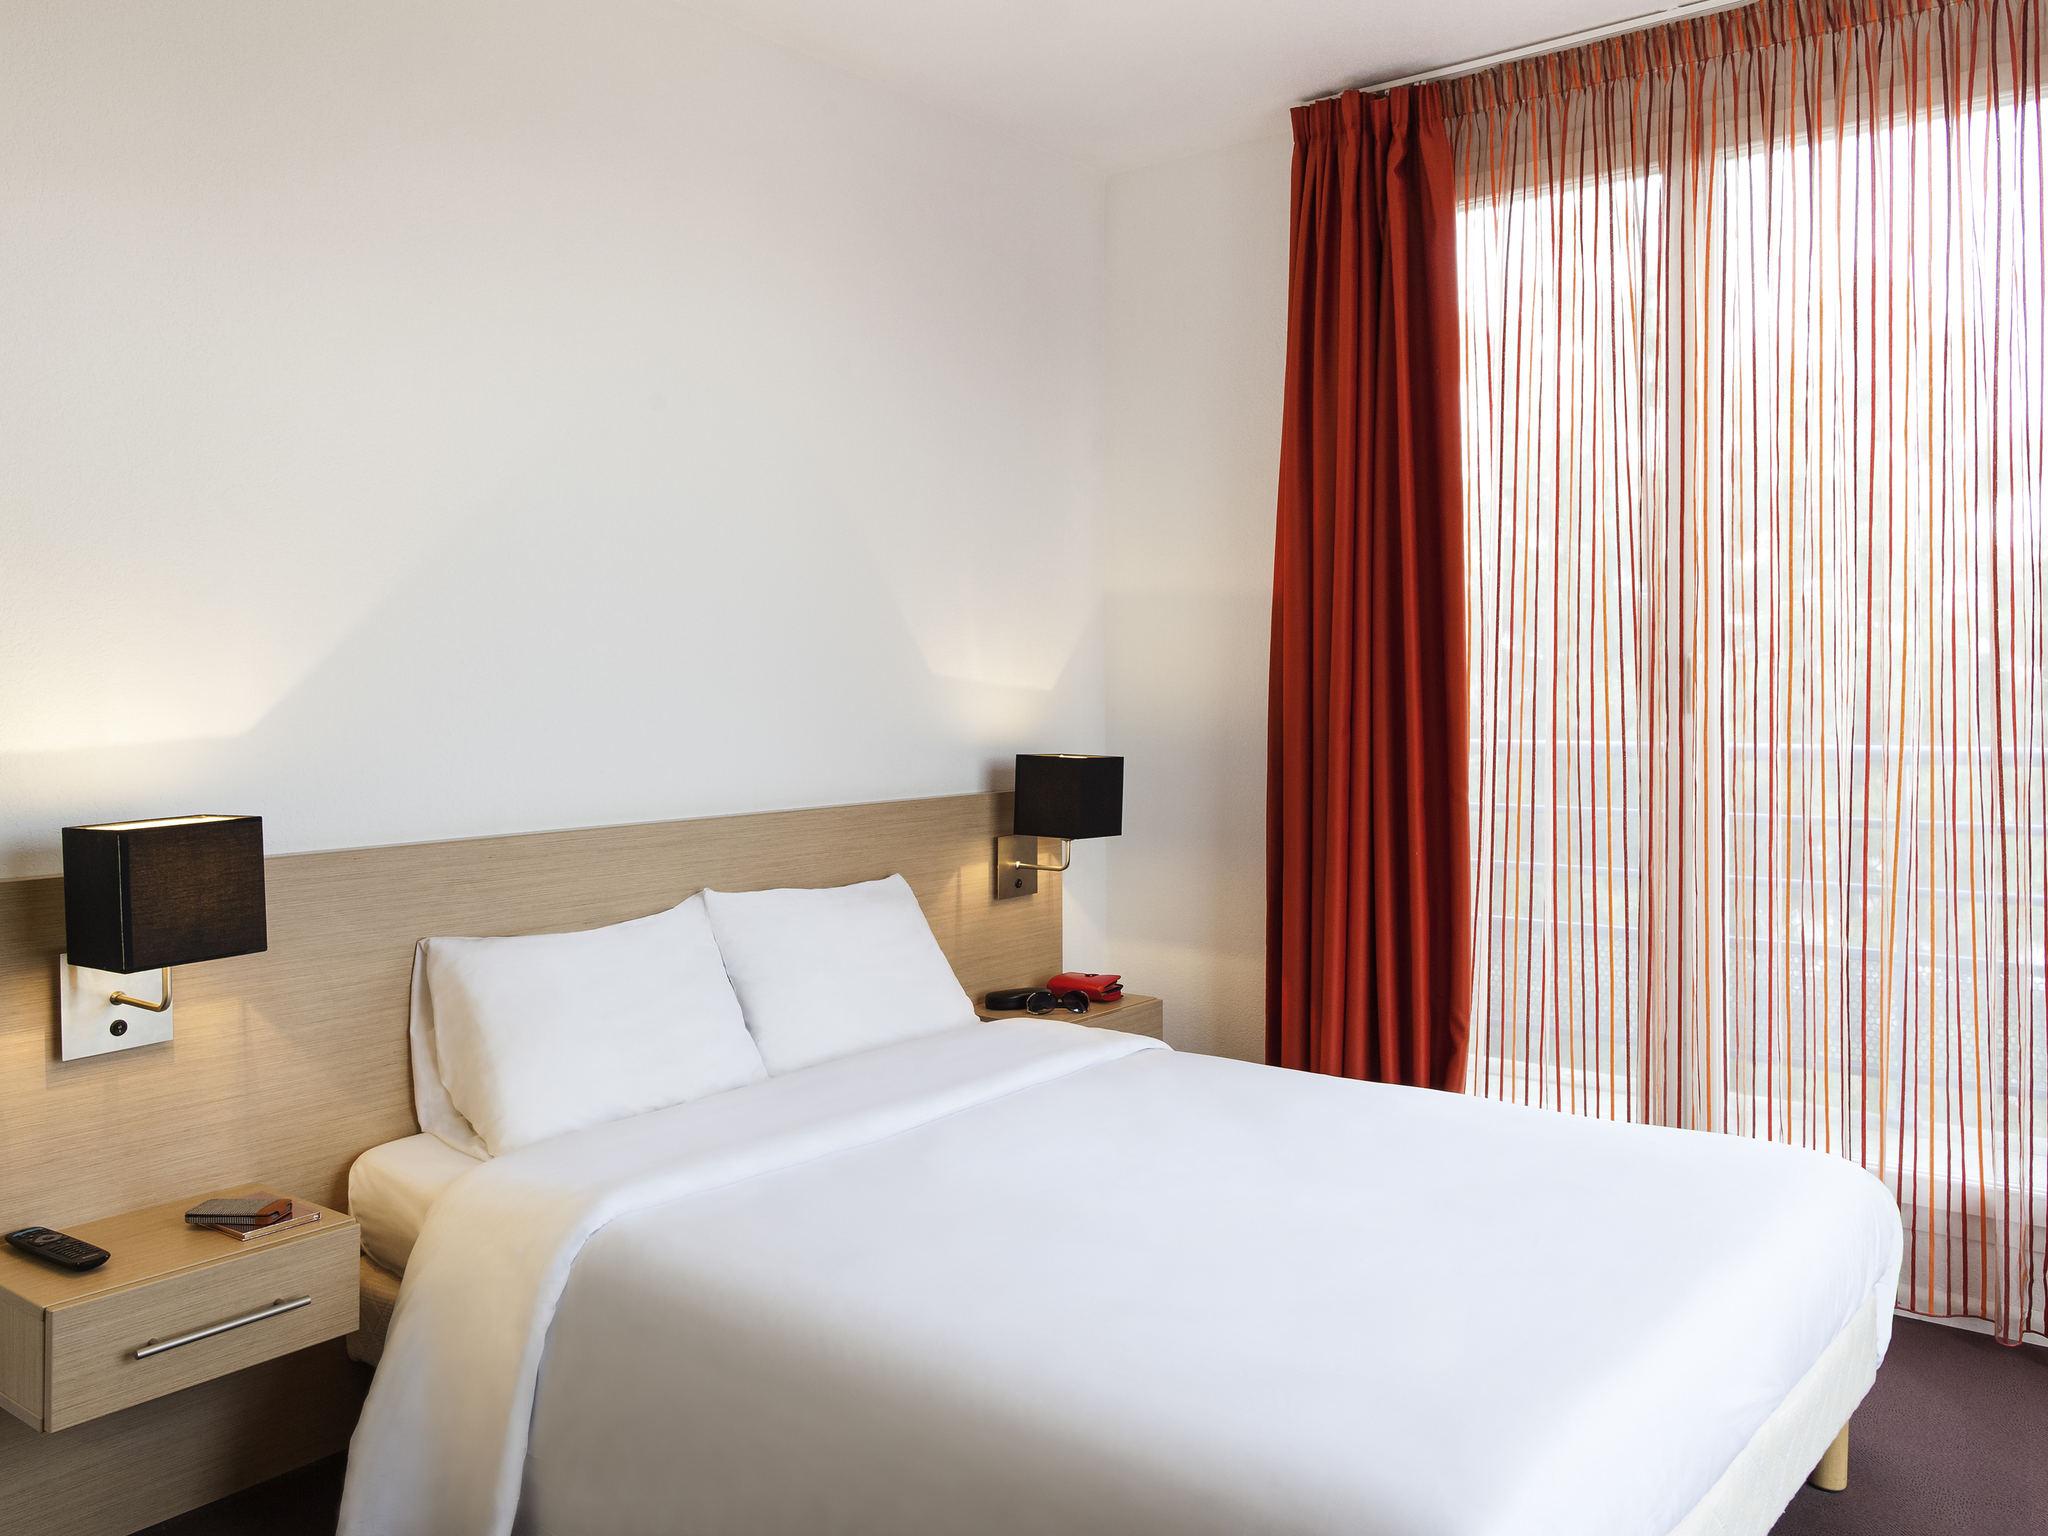 Hotel – Aparthotel Adagio access Saint Louis Bâle